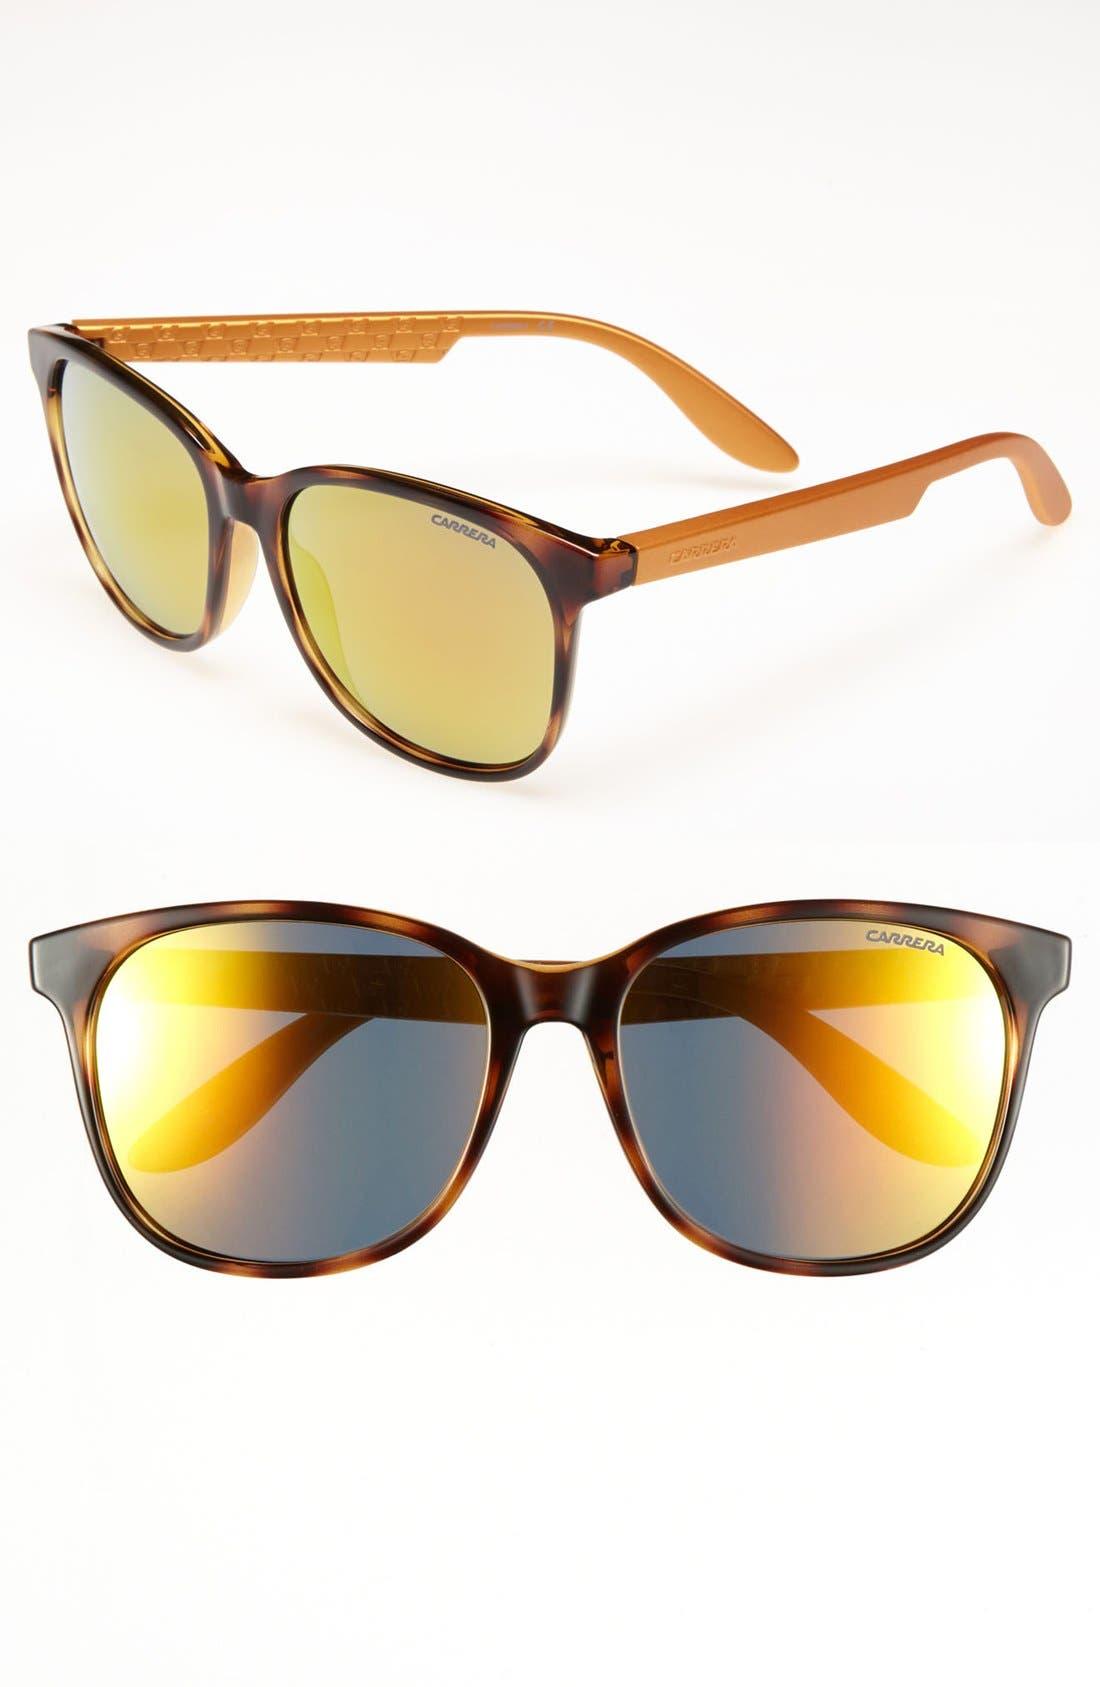 56 mm Sunglasses,                             Main thumbnail 1, color,                             Havana